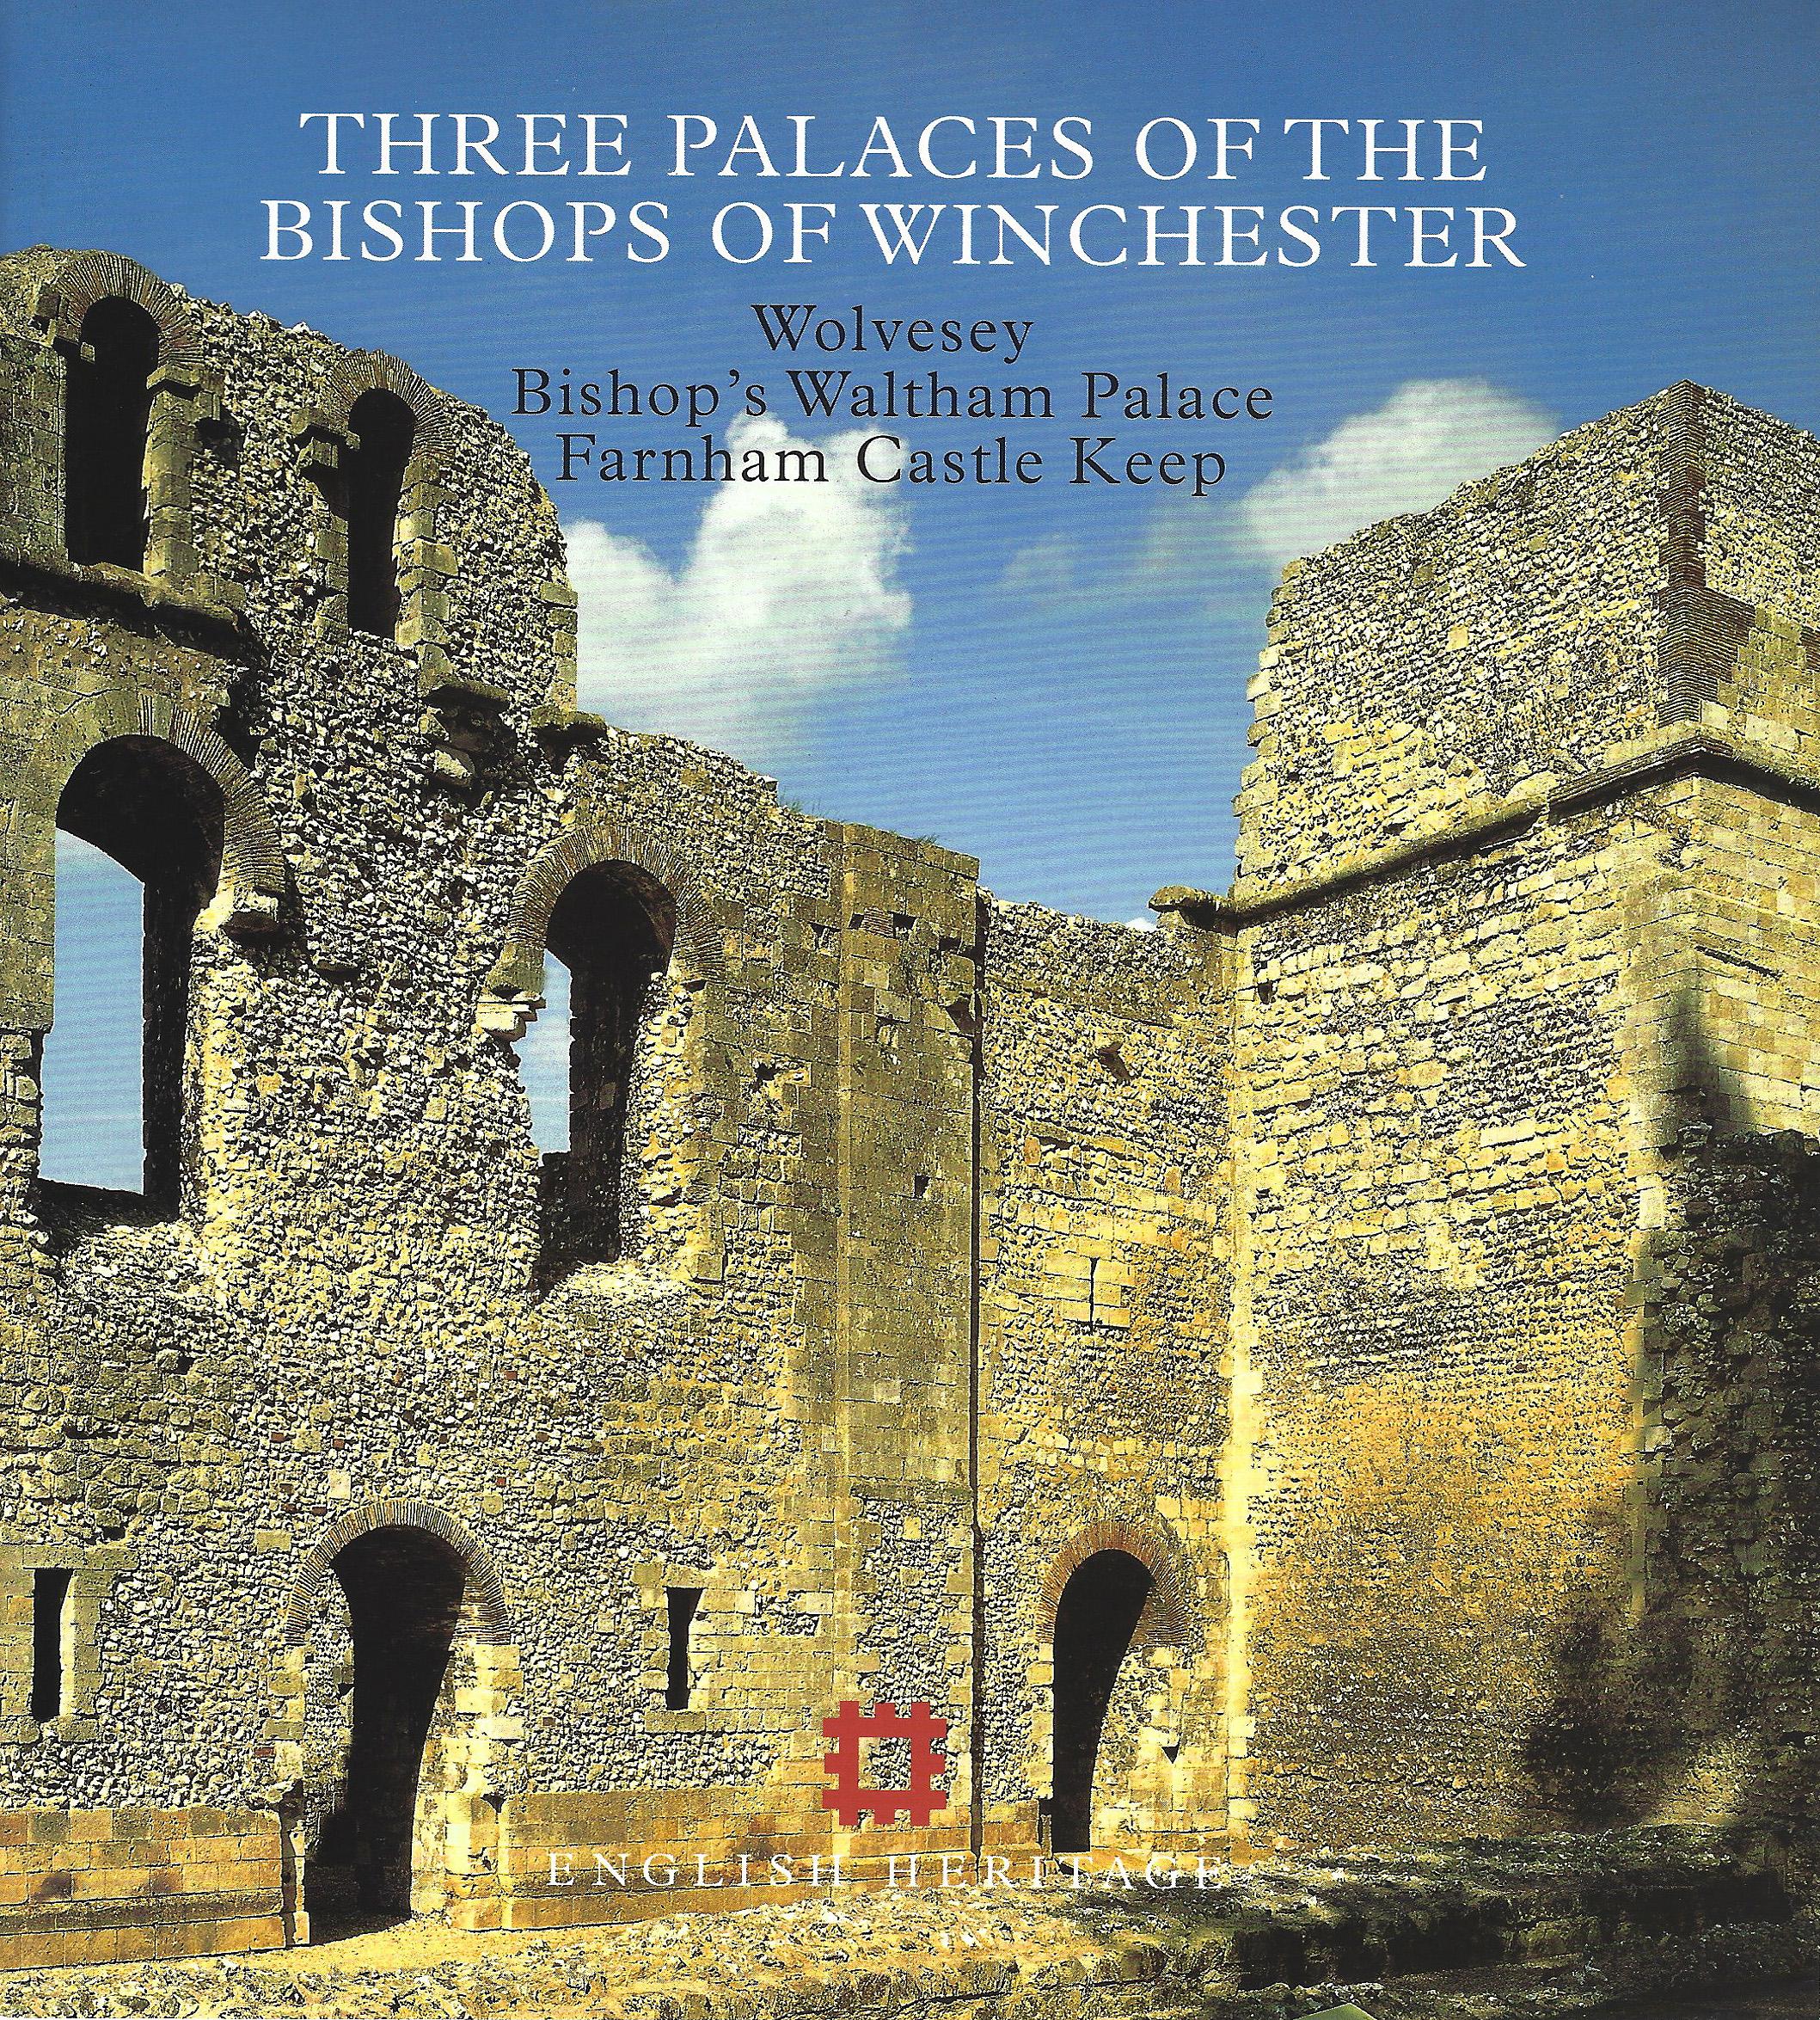 Guide to Bishops of Winchester: Wolvesey, Bishop's Waltham, Farnham